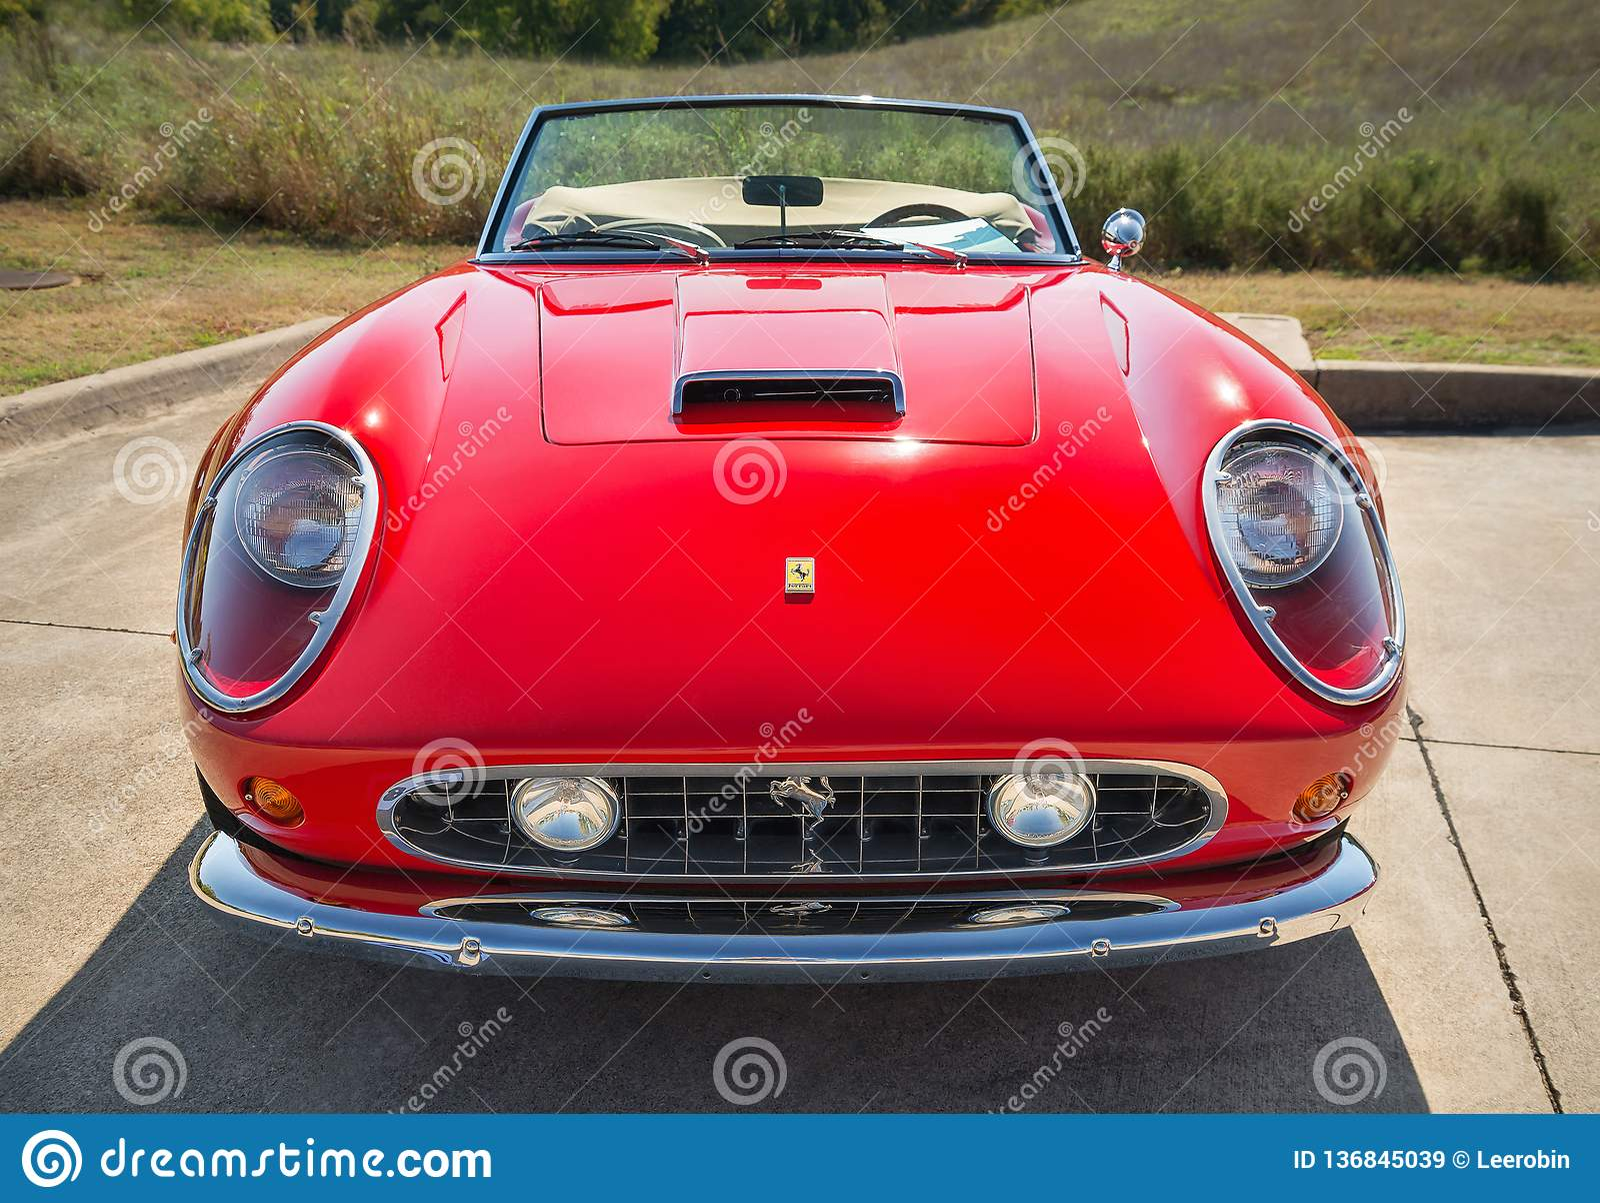 Red 1962 Ferrari 250 Gt California Spyder Editorial Stock Image